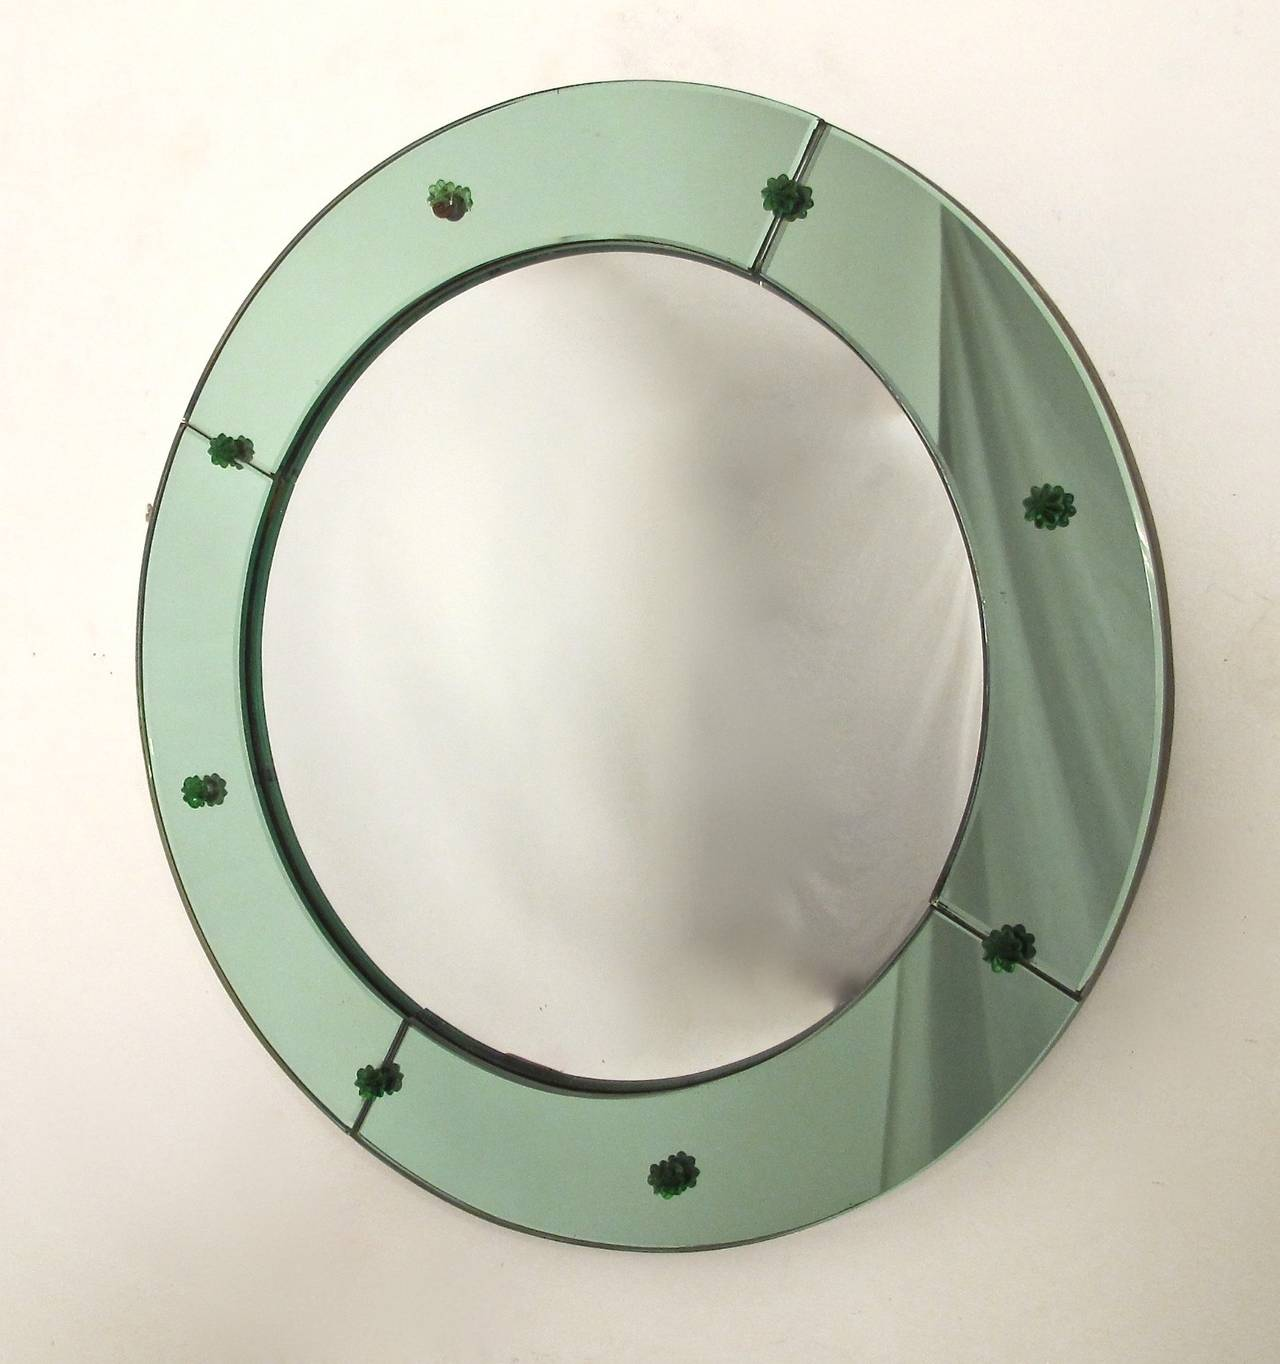 Art Deco Convex Mirror In Good Condition For Sale In San Francisco, CA